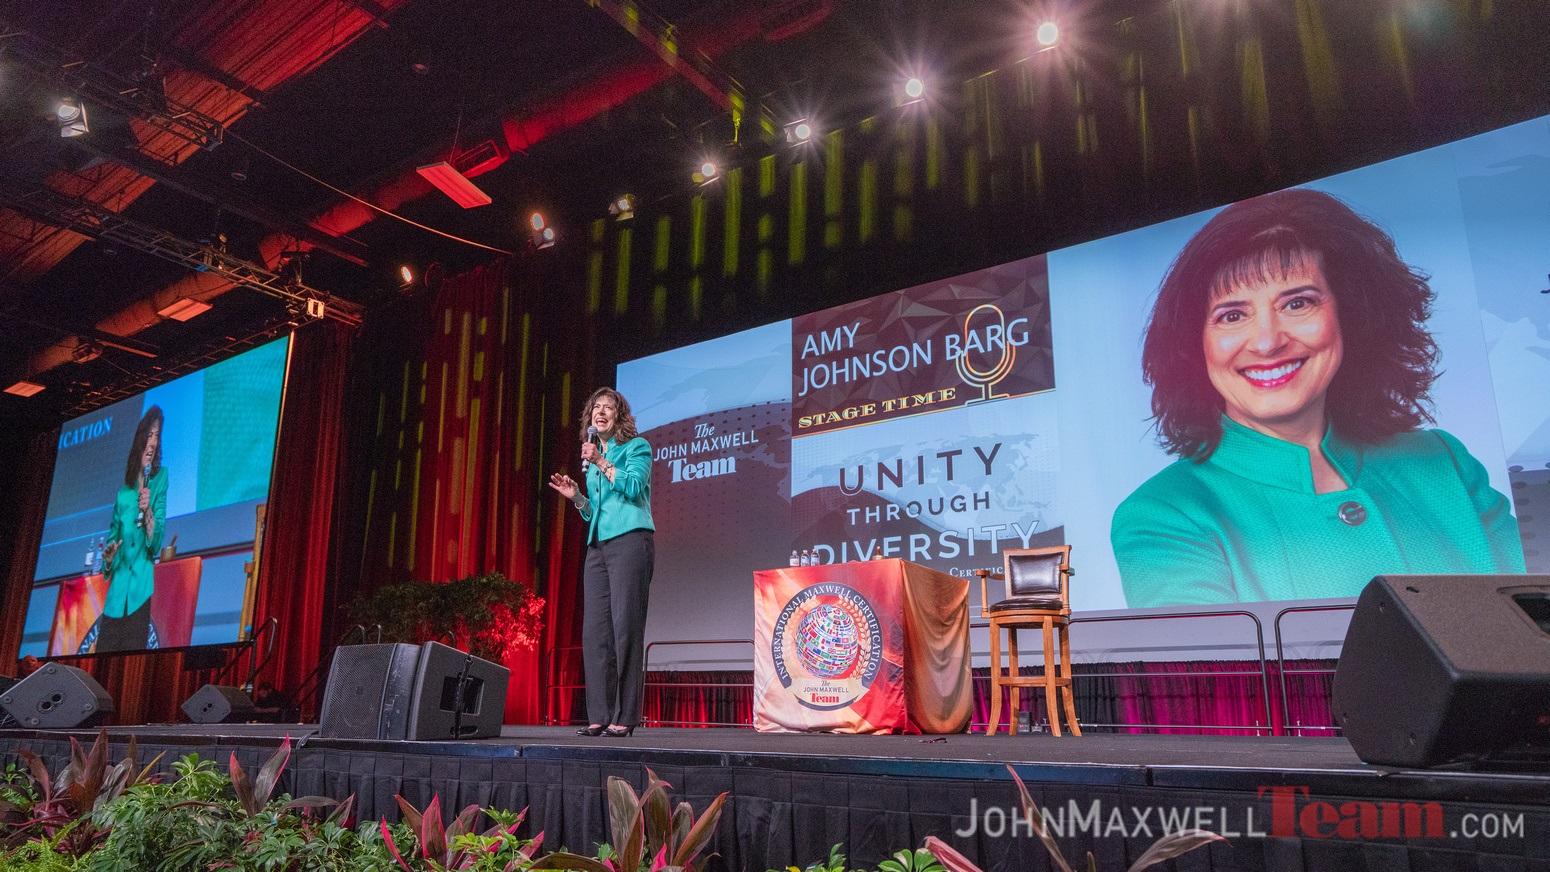 Amy Barg Speaking at Unity.jpg